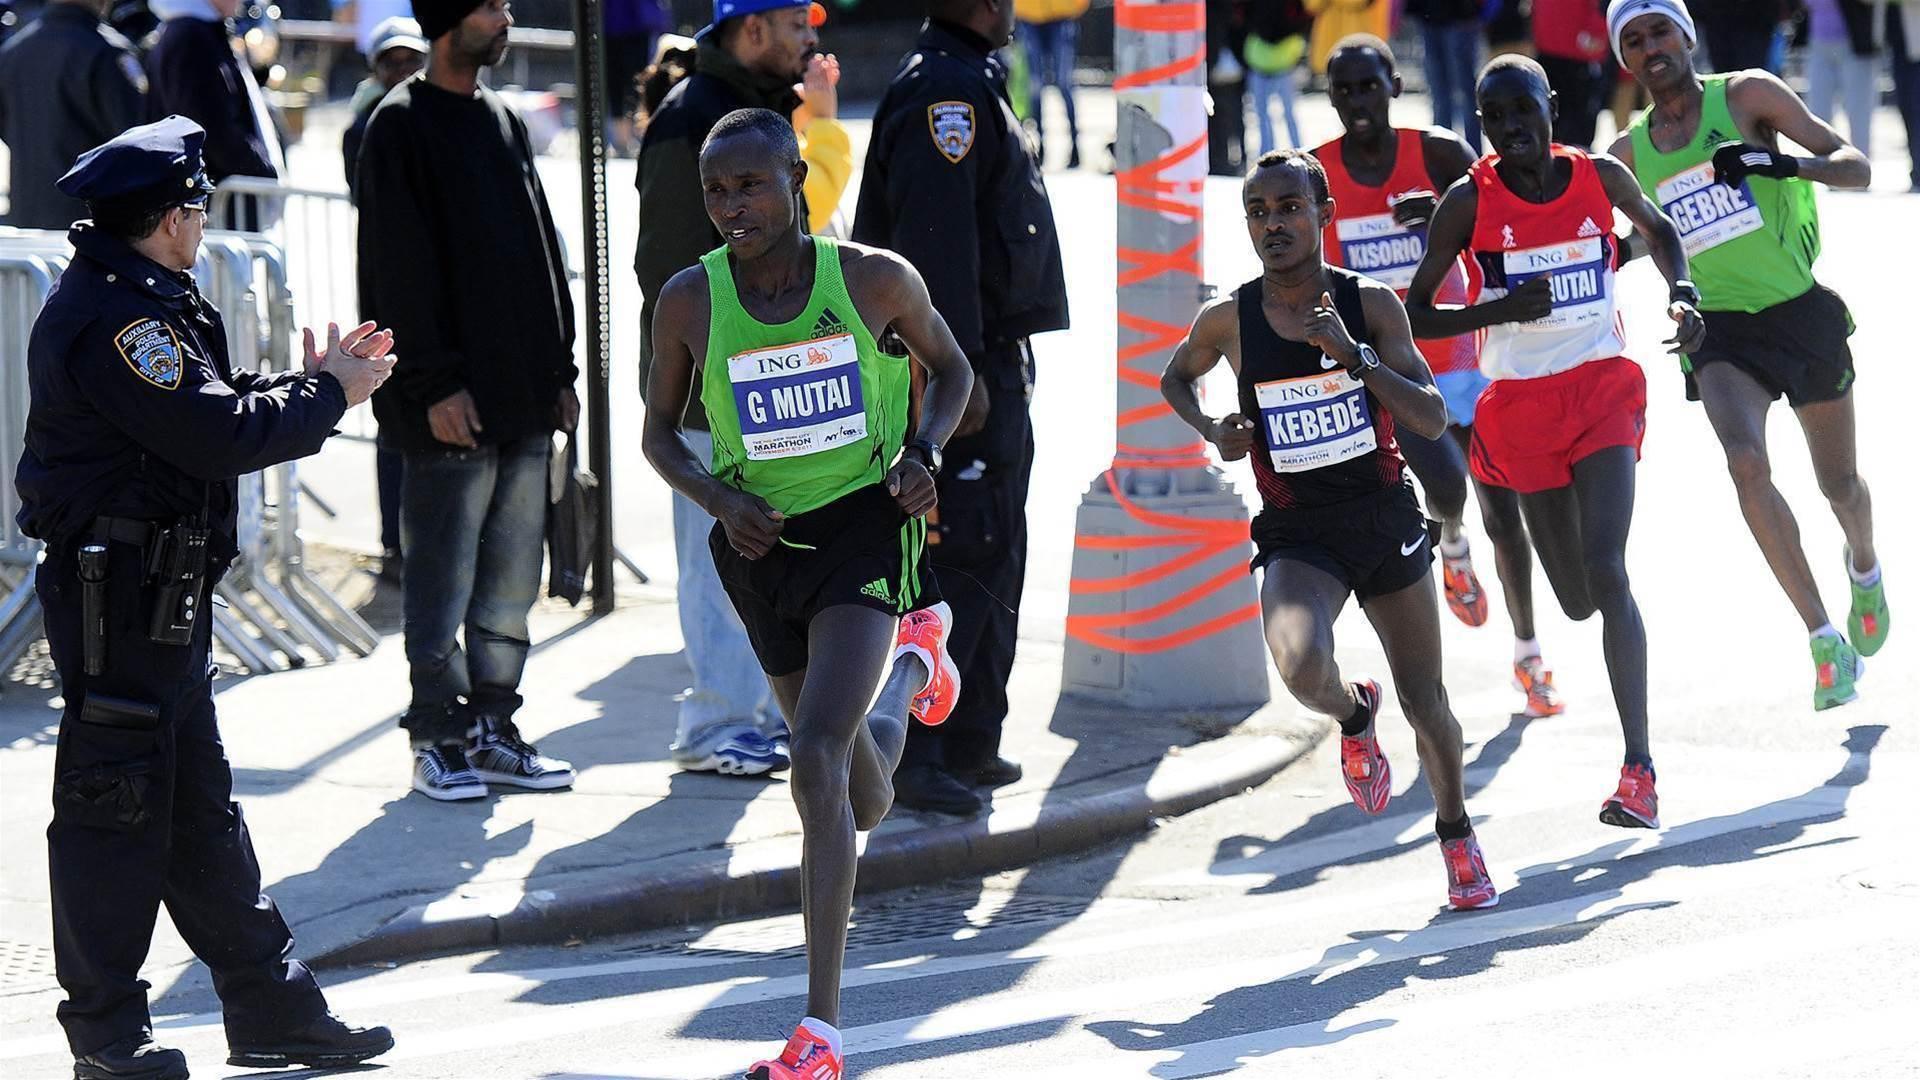 When the race isn't run, part II